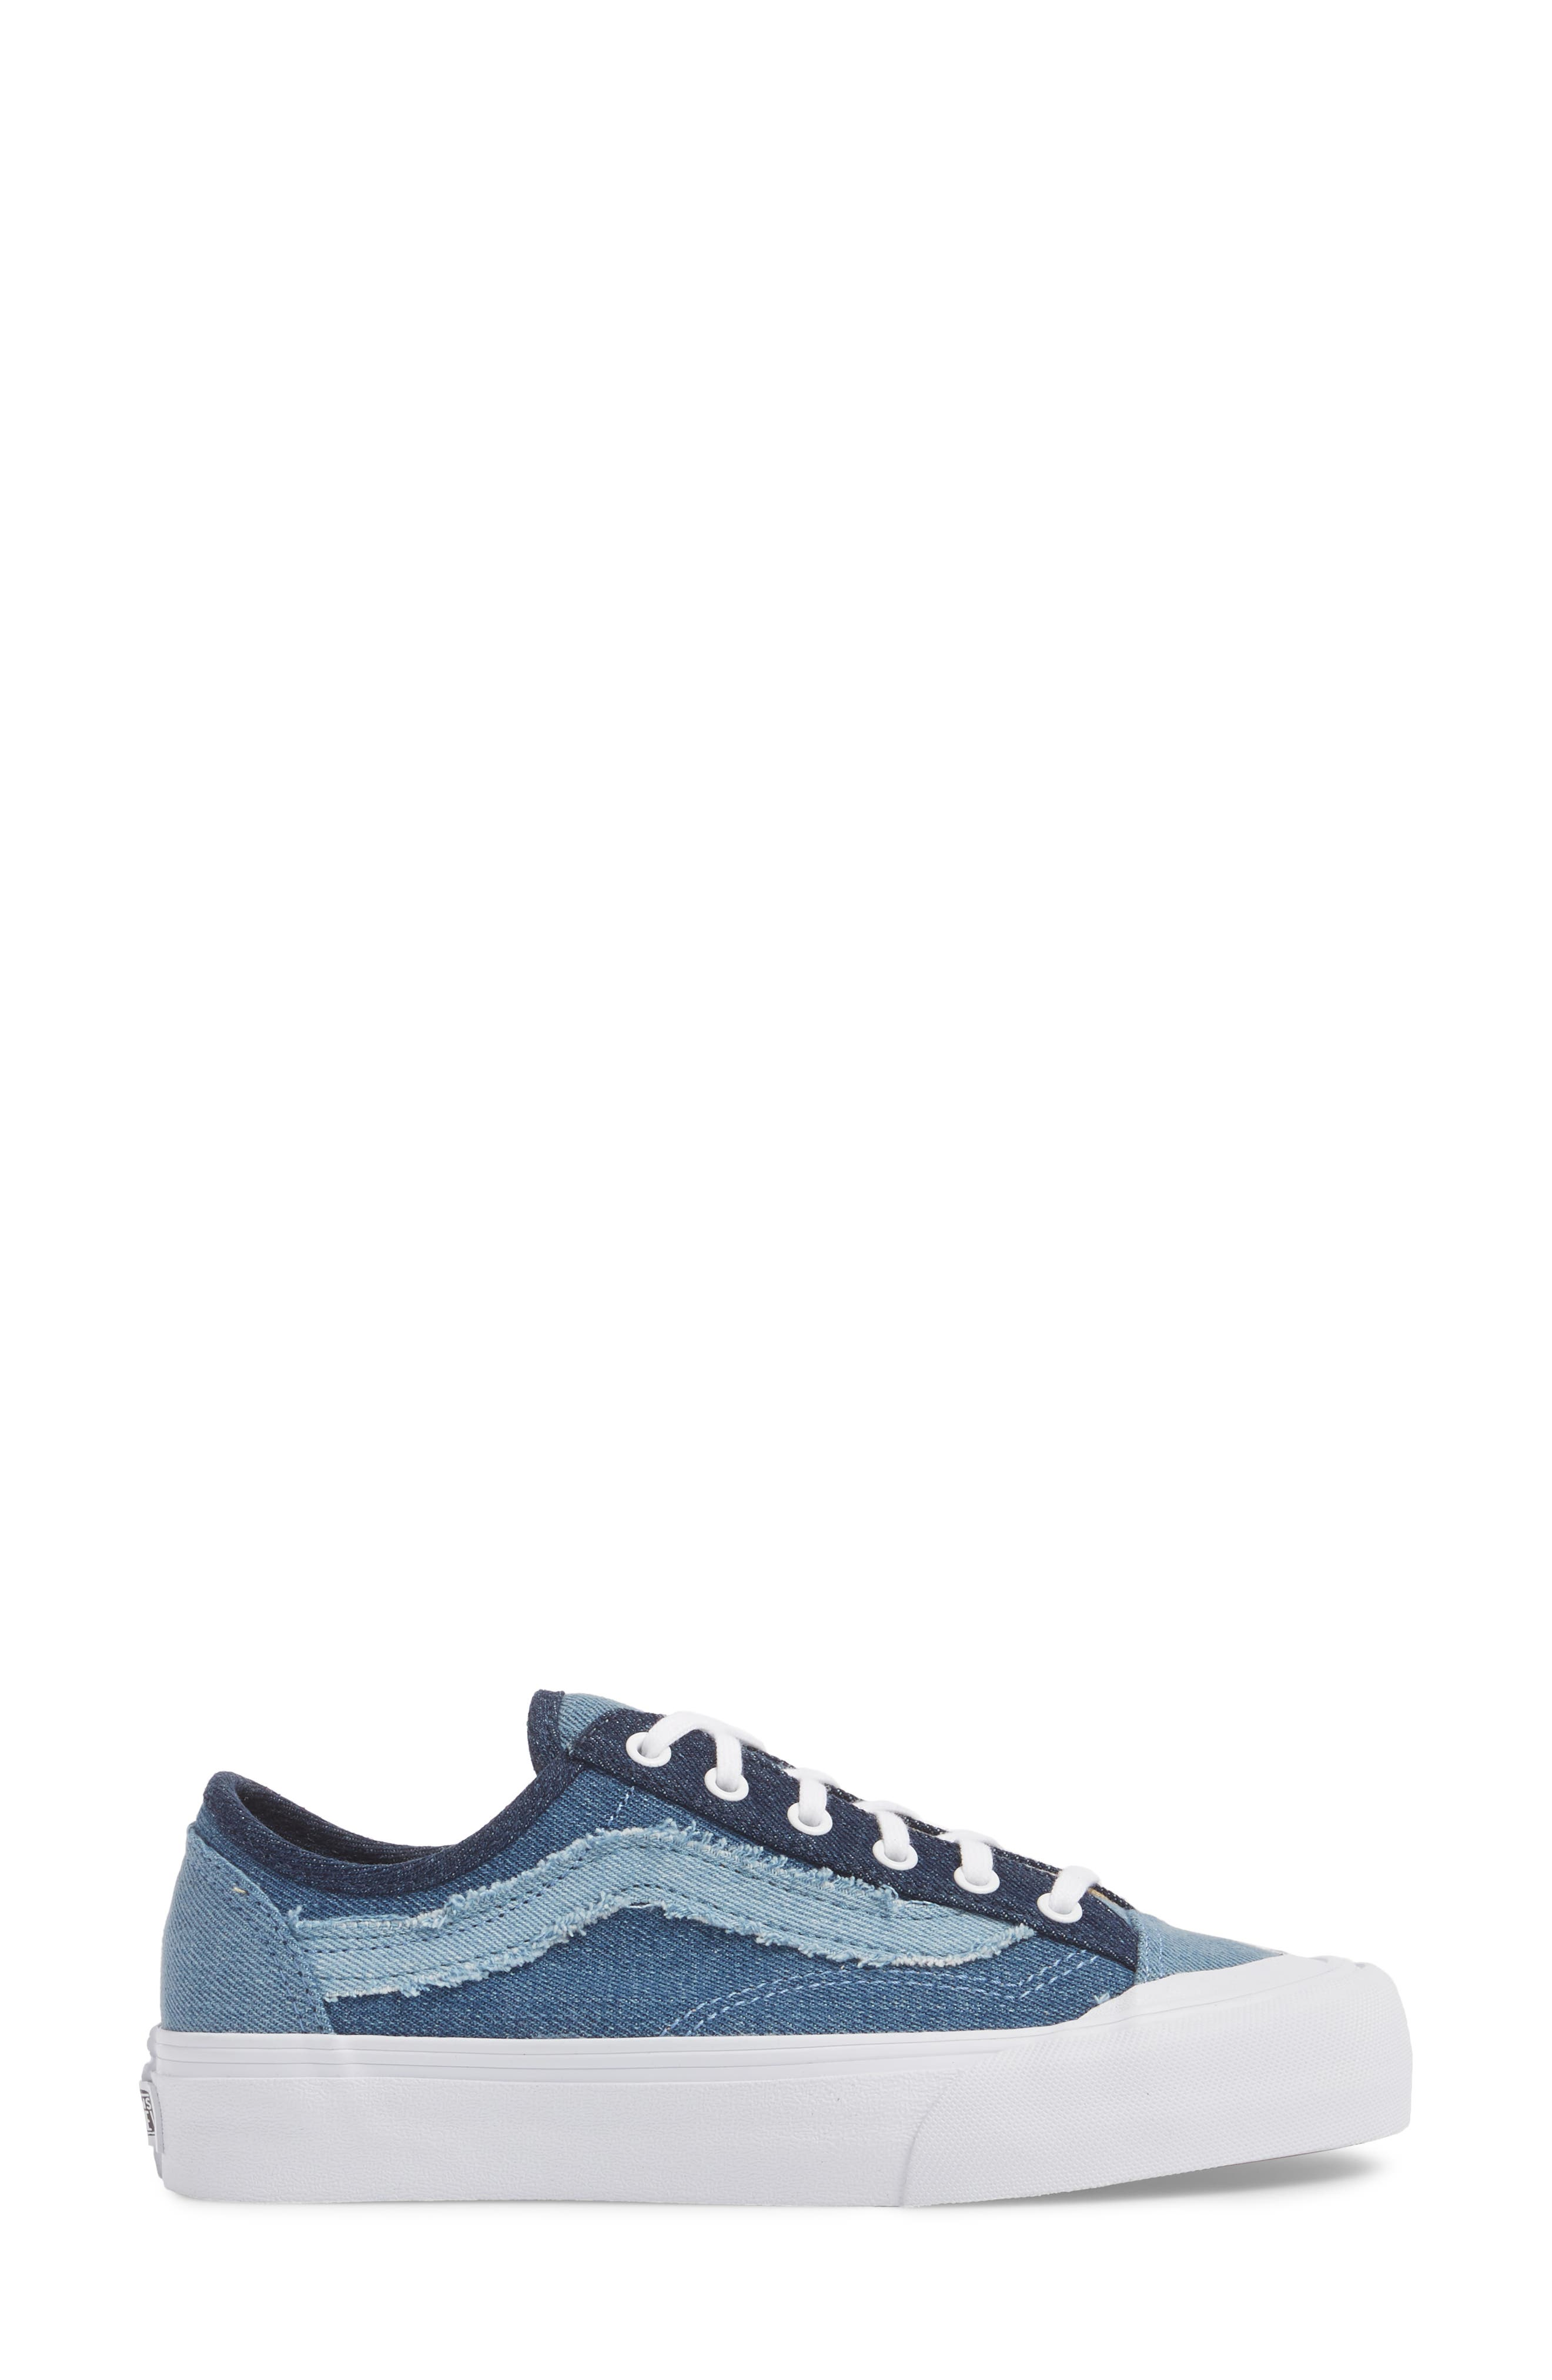 Style 36 Decon Sneaker,                             Alternate thumbnail 3, color,                             Frayed Denim